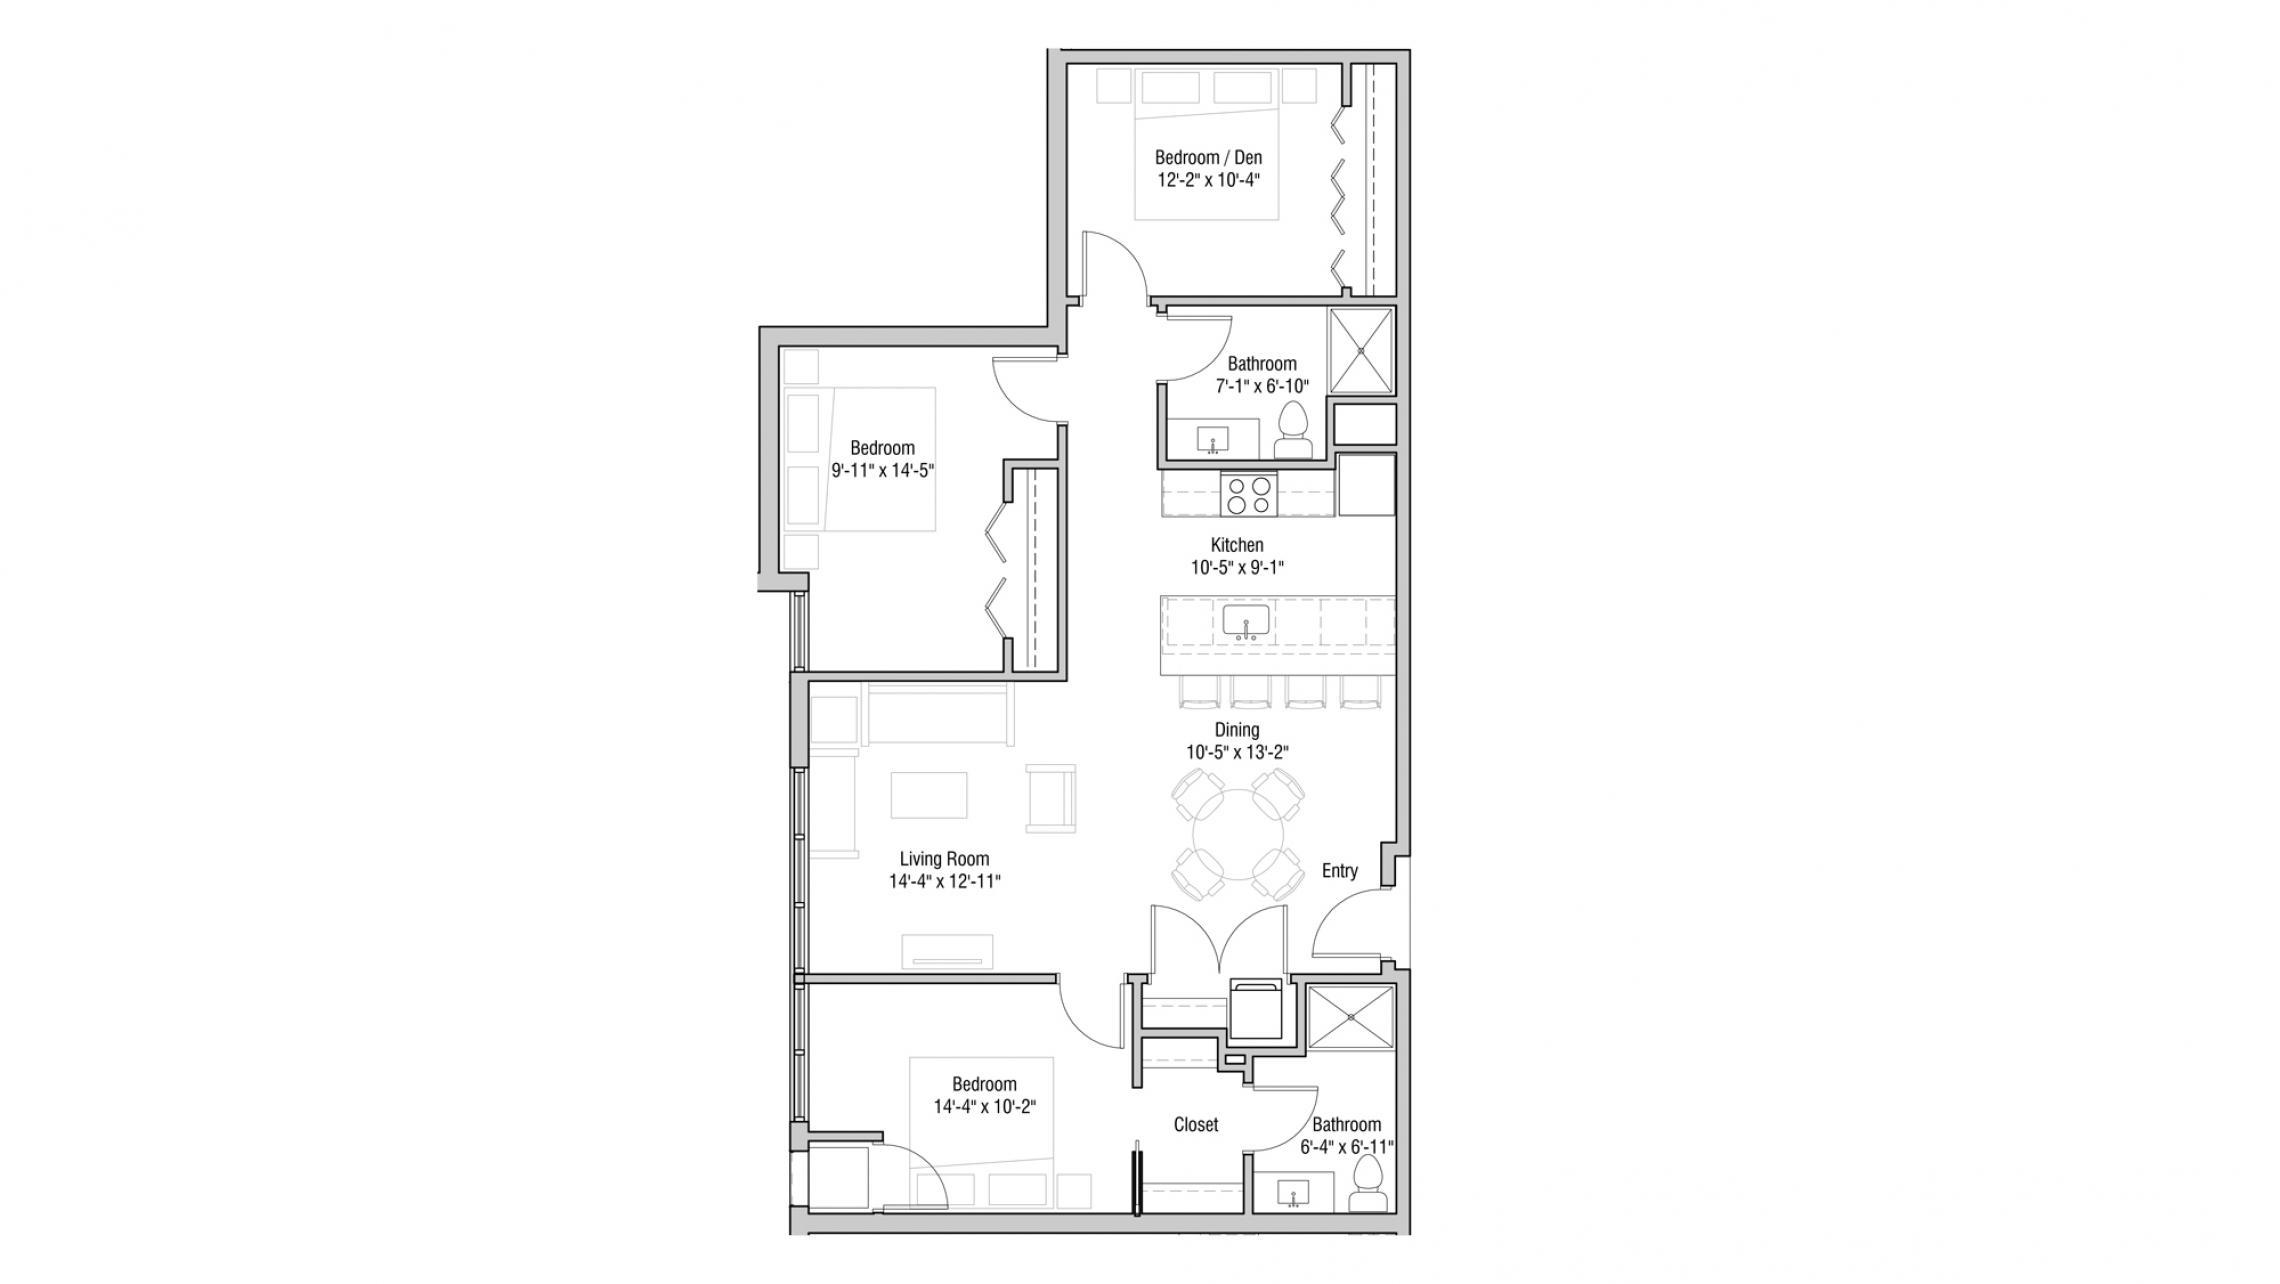 ULI Quarter Row 410 - Two Bedroom, Two Bathroom